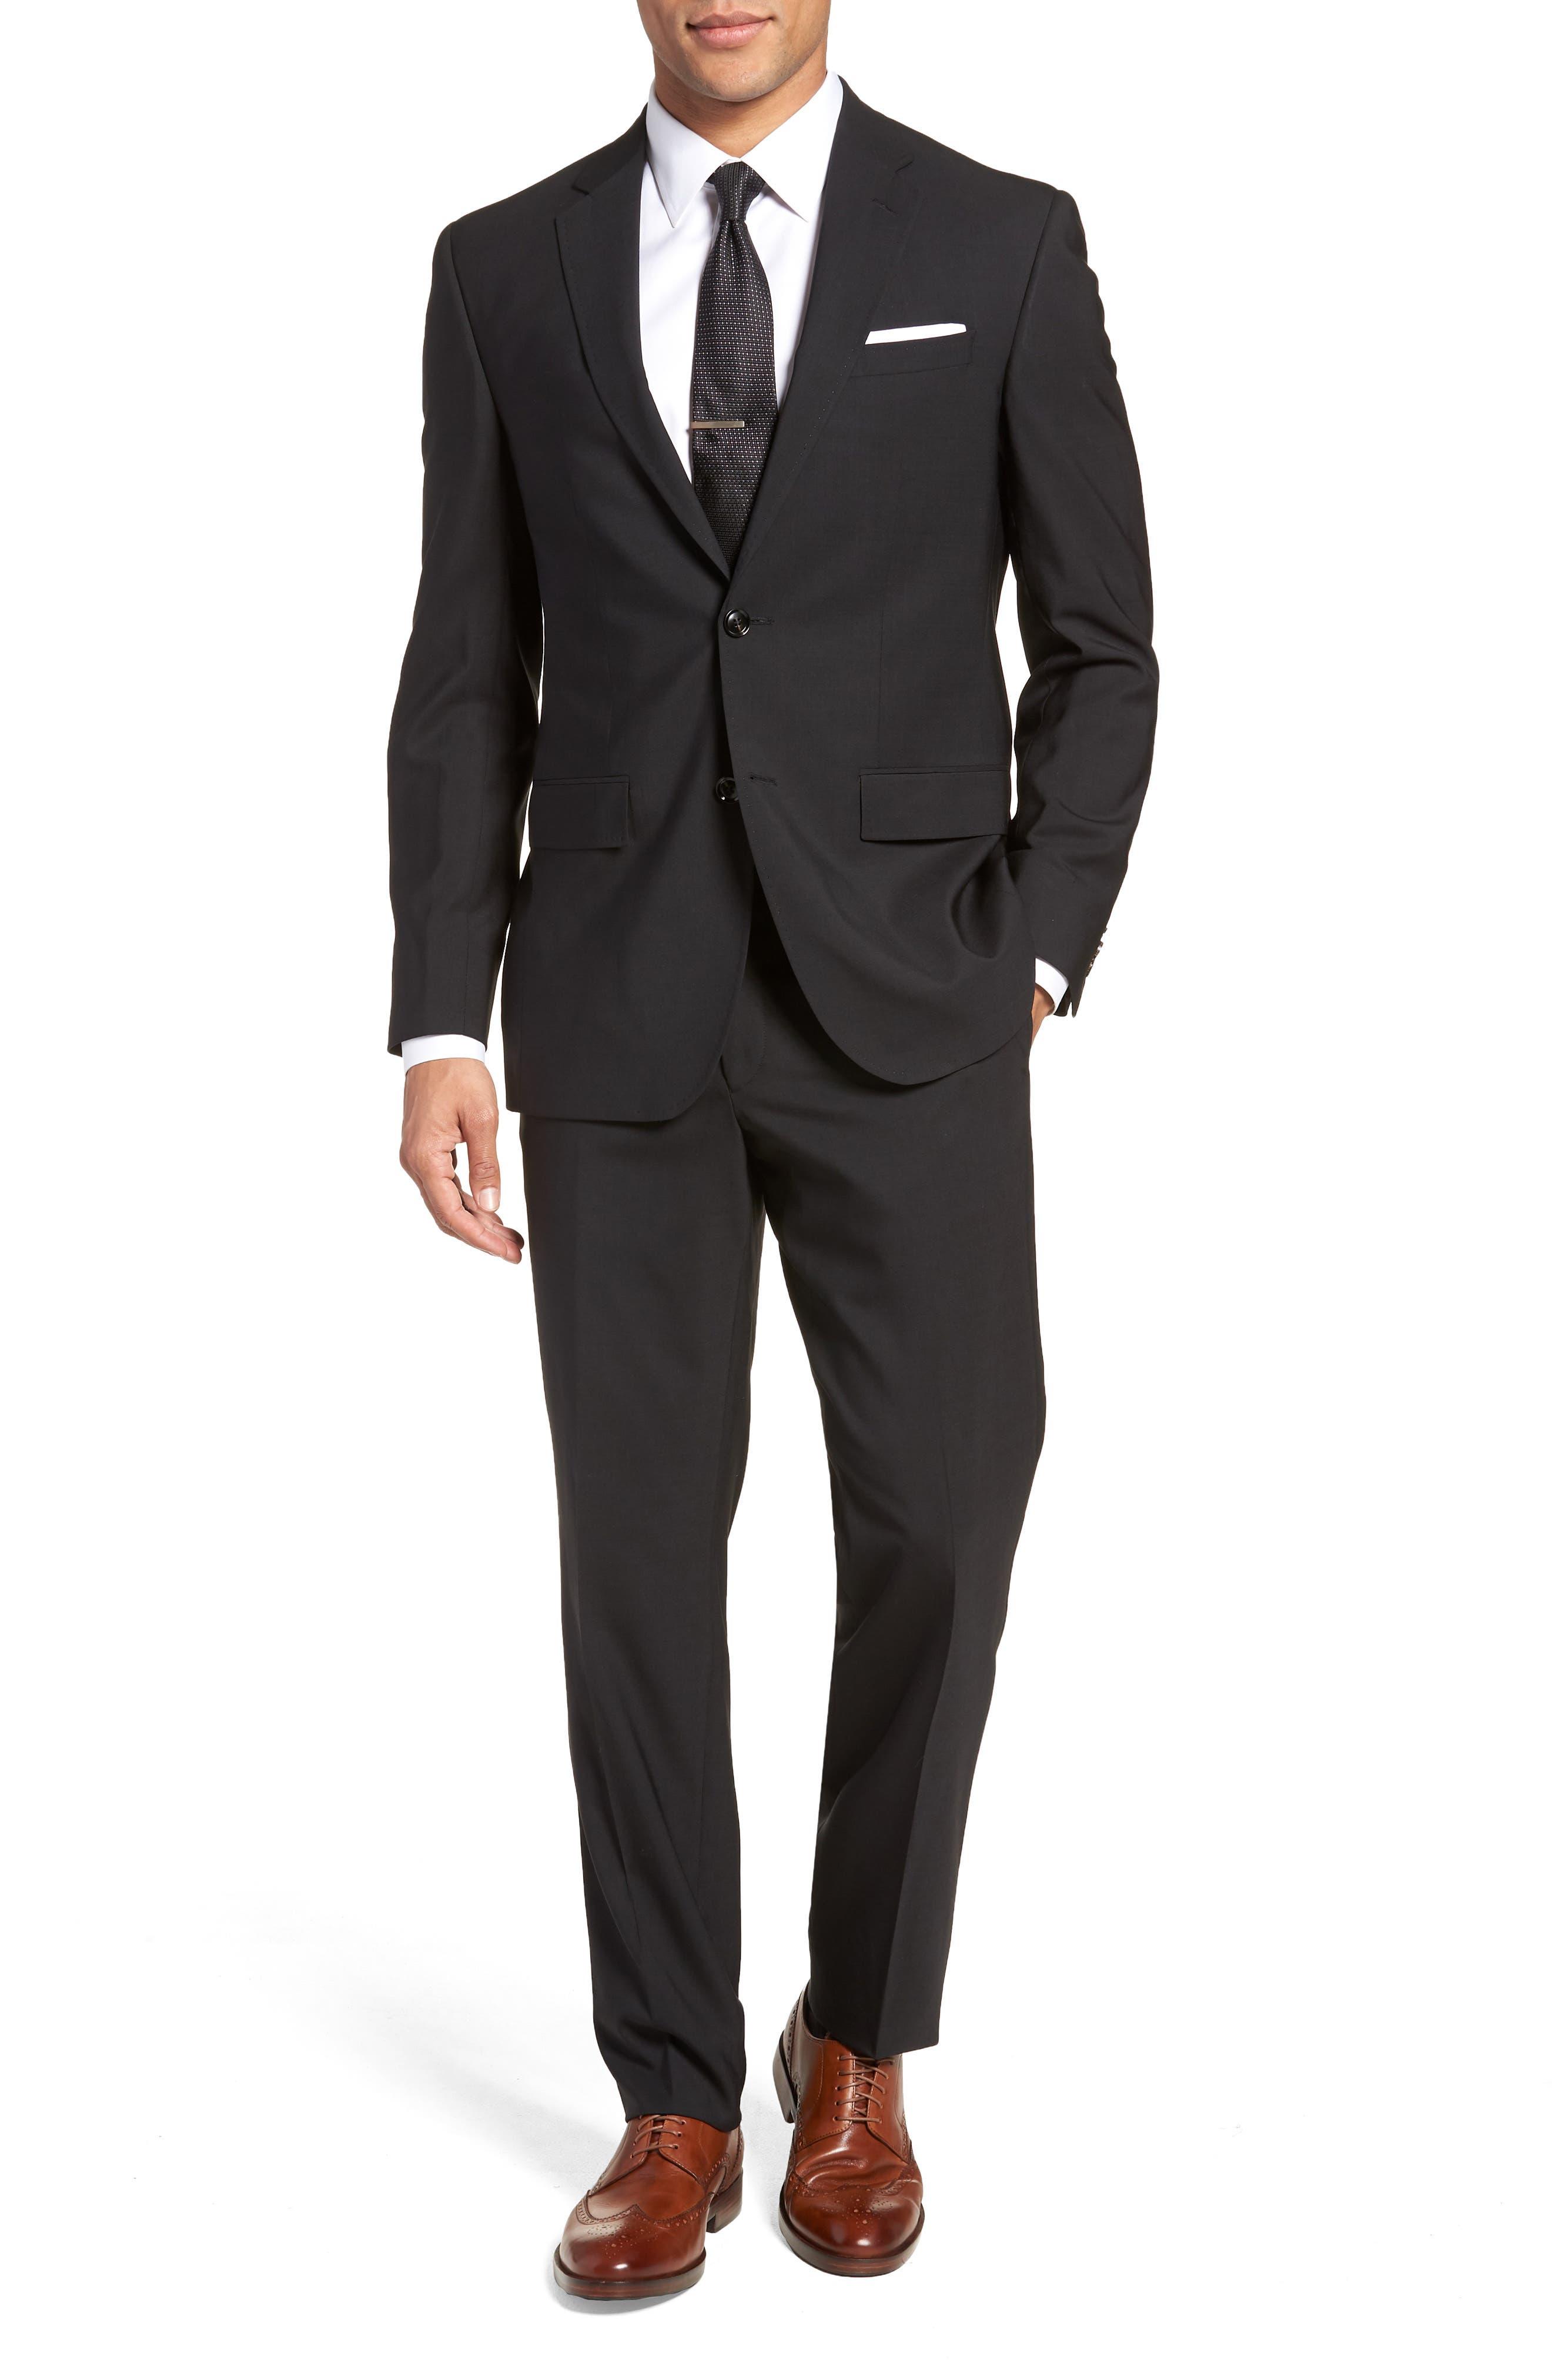 Jay Trim Fit Solid Wool Suit,                             Main thumbnail 1, color,                             Black